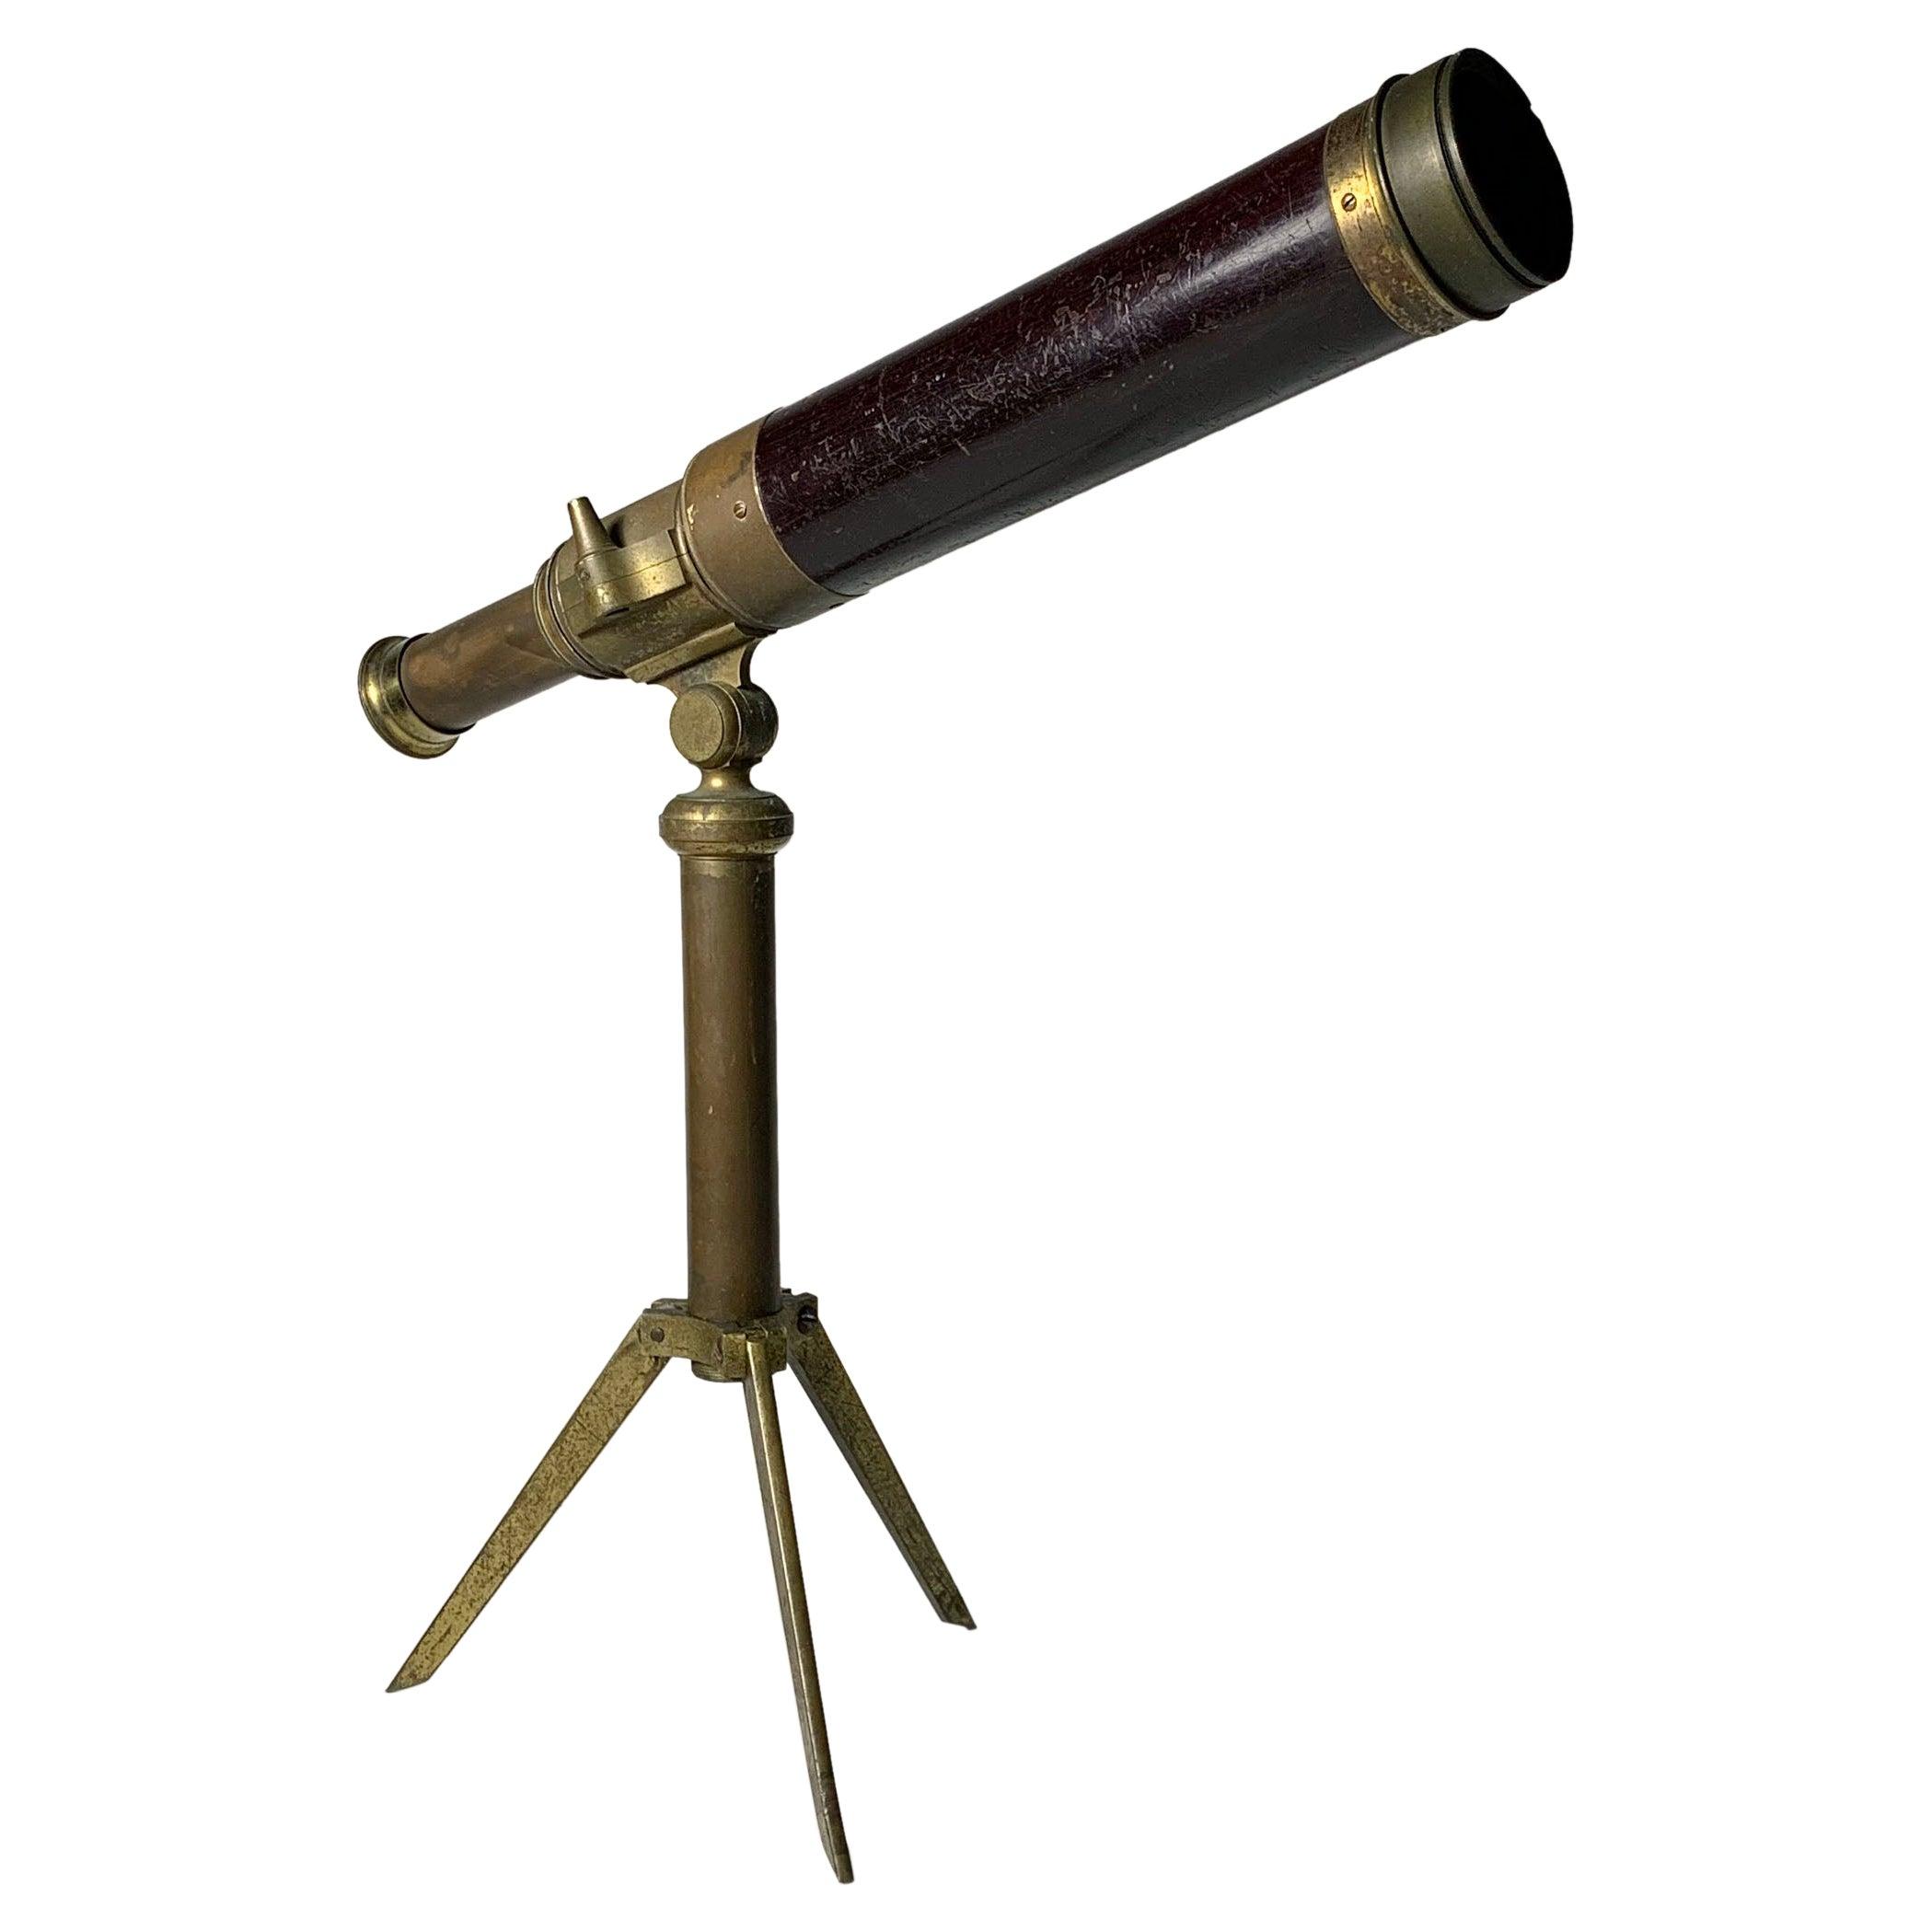 Charming Vintage Gentleman's Library Telescope